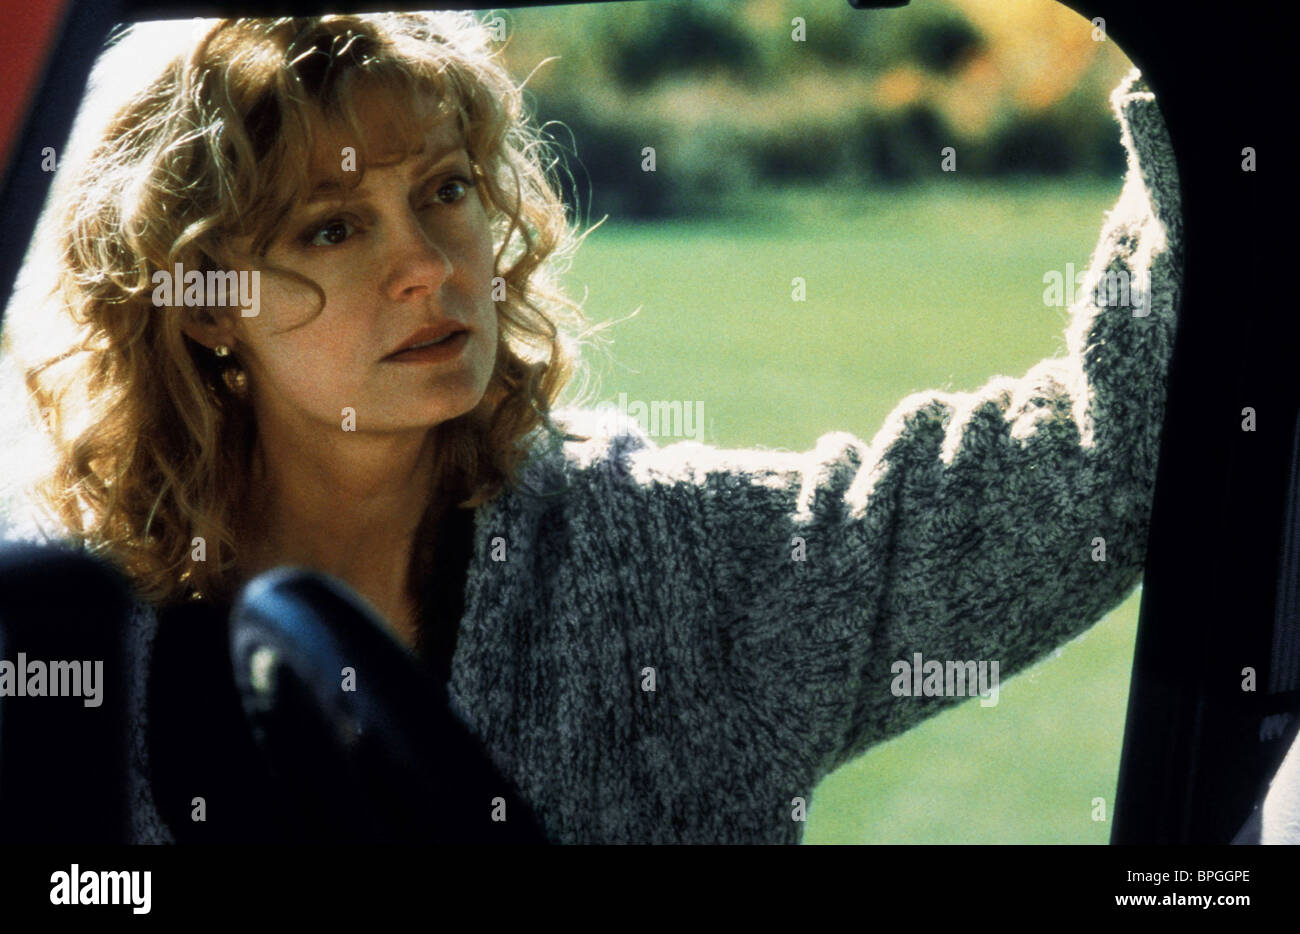 SUSAN SARANDON EARTHLY POSSESSIONS (1999) - Stock Image